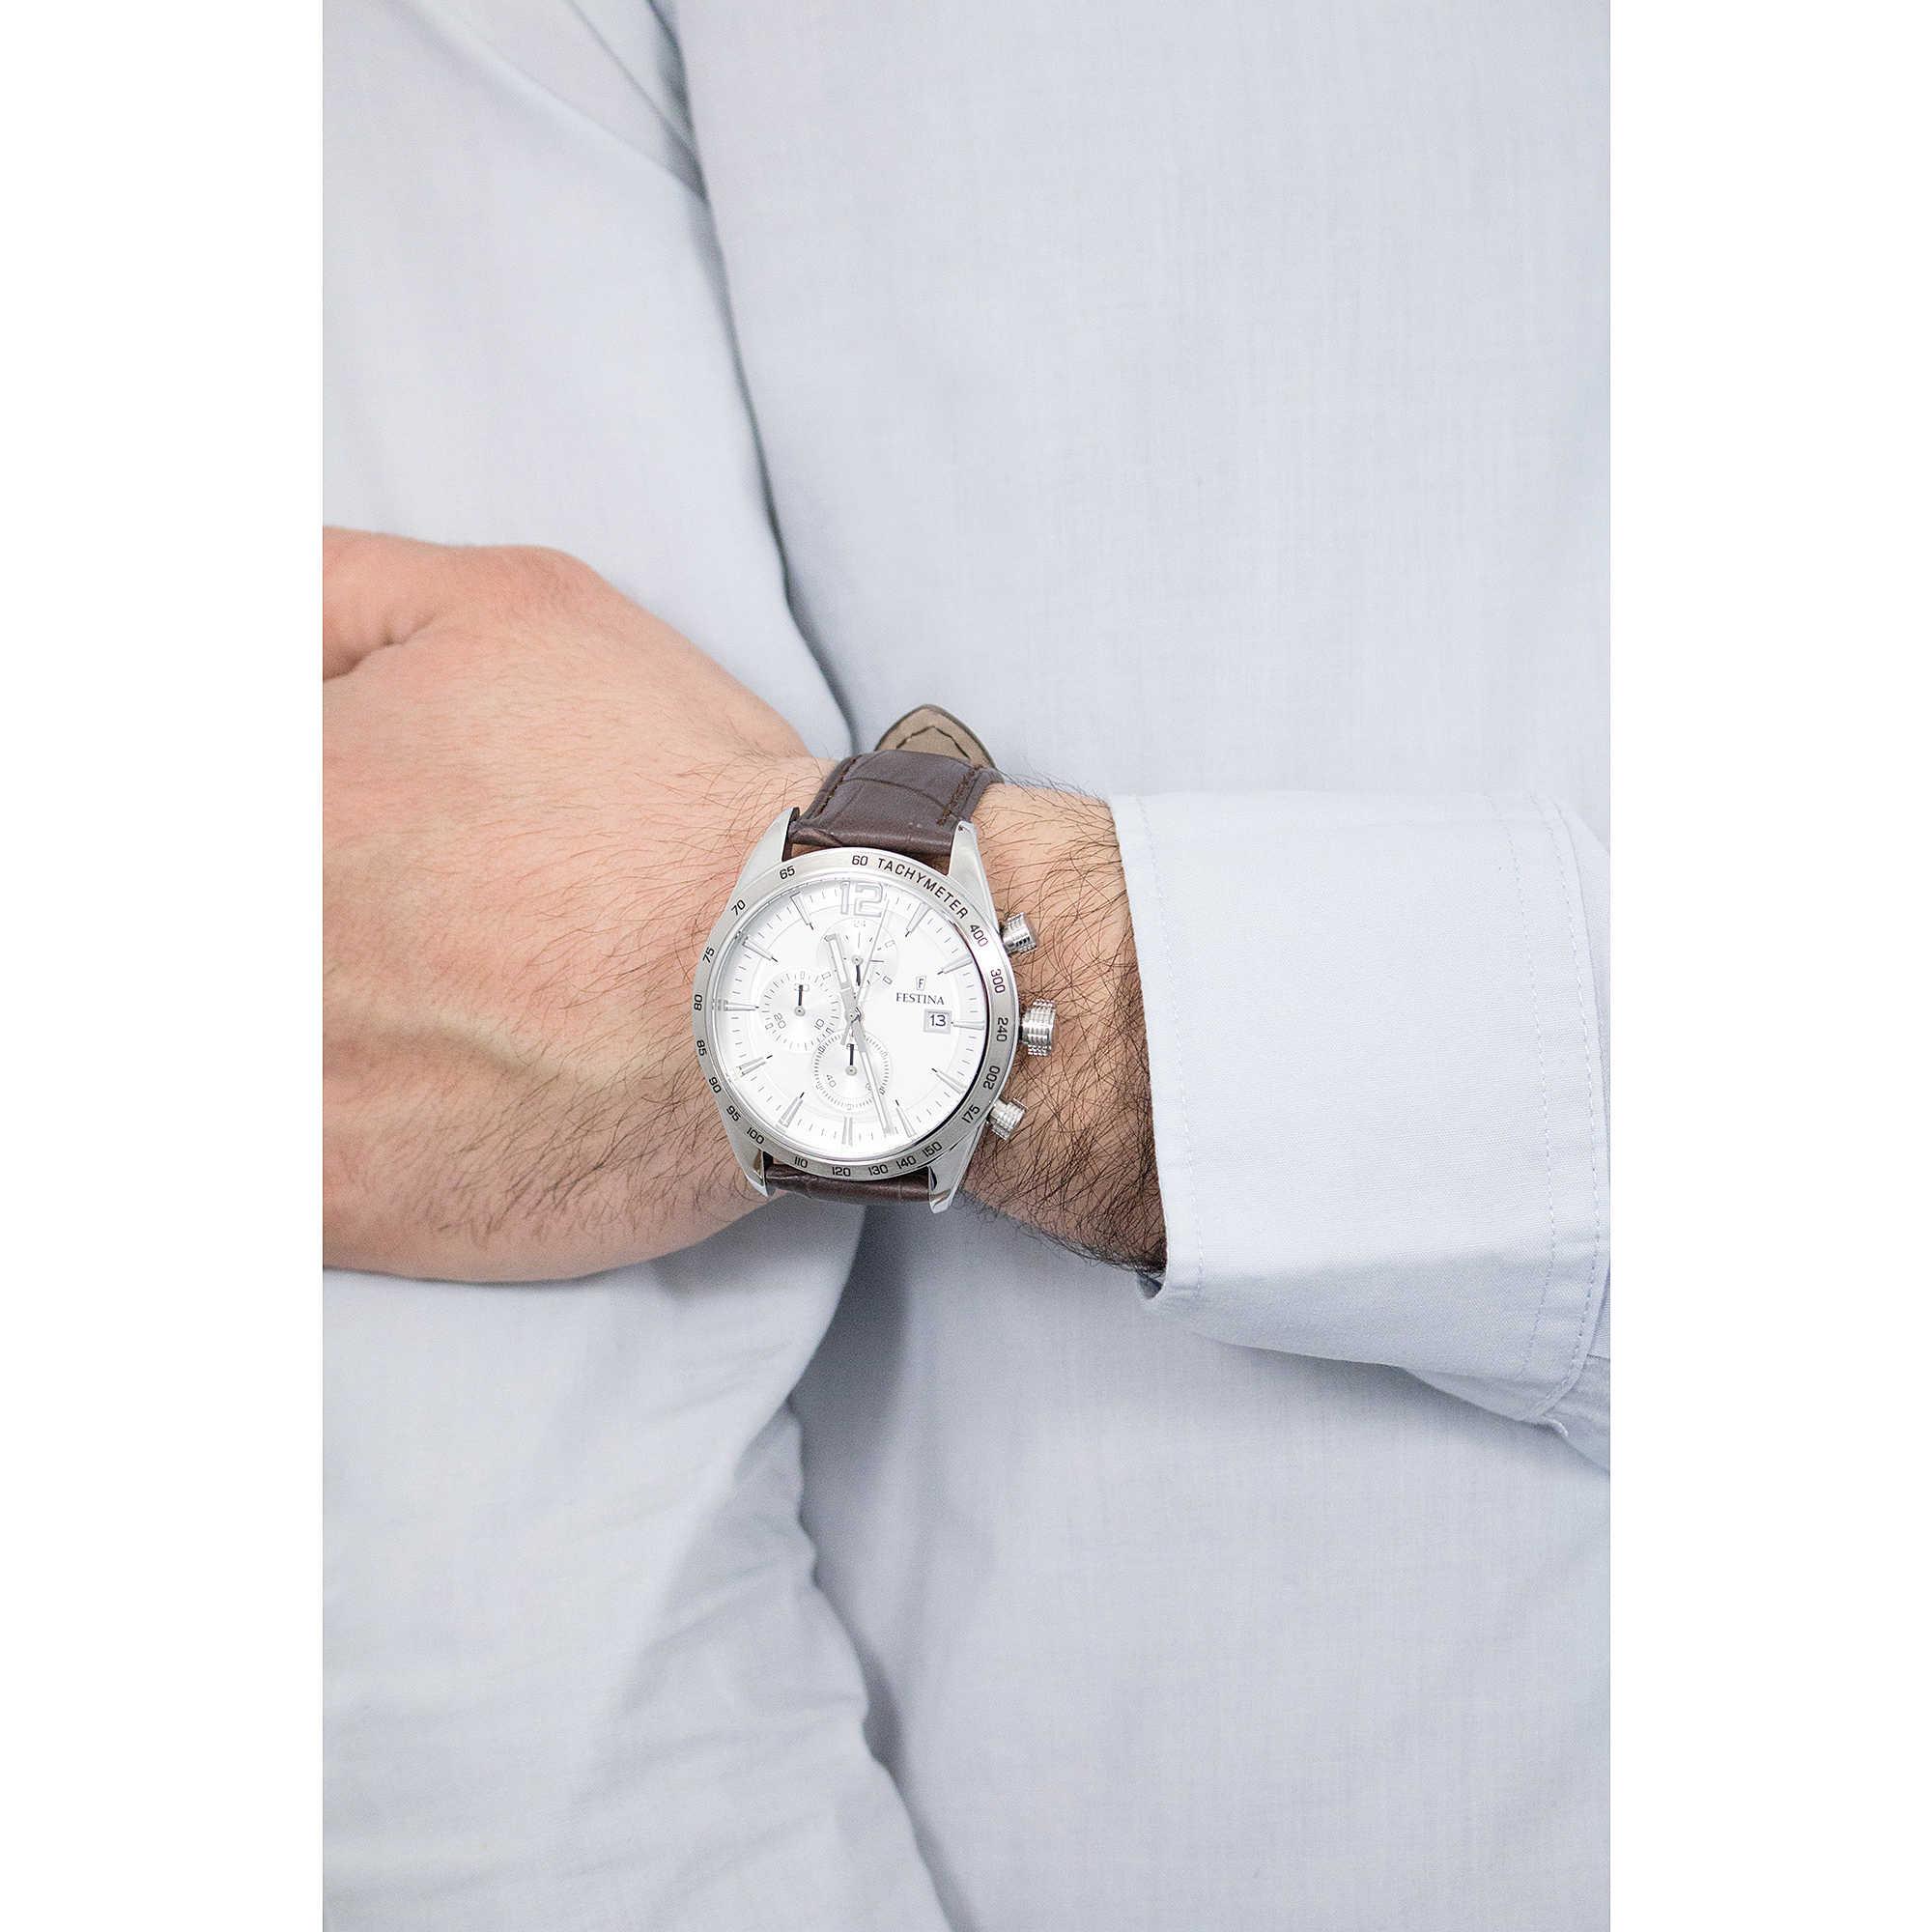 581ed85256 Festina chronographes Timeless Chronograph homme F16760/1 photo wearing.  zoom